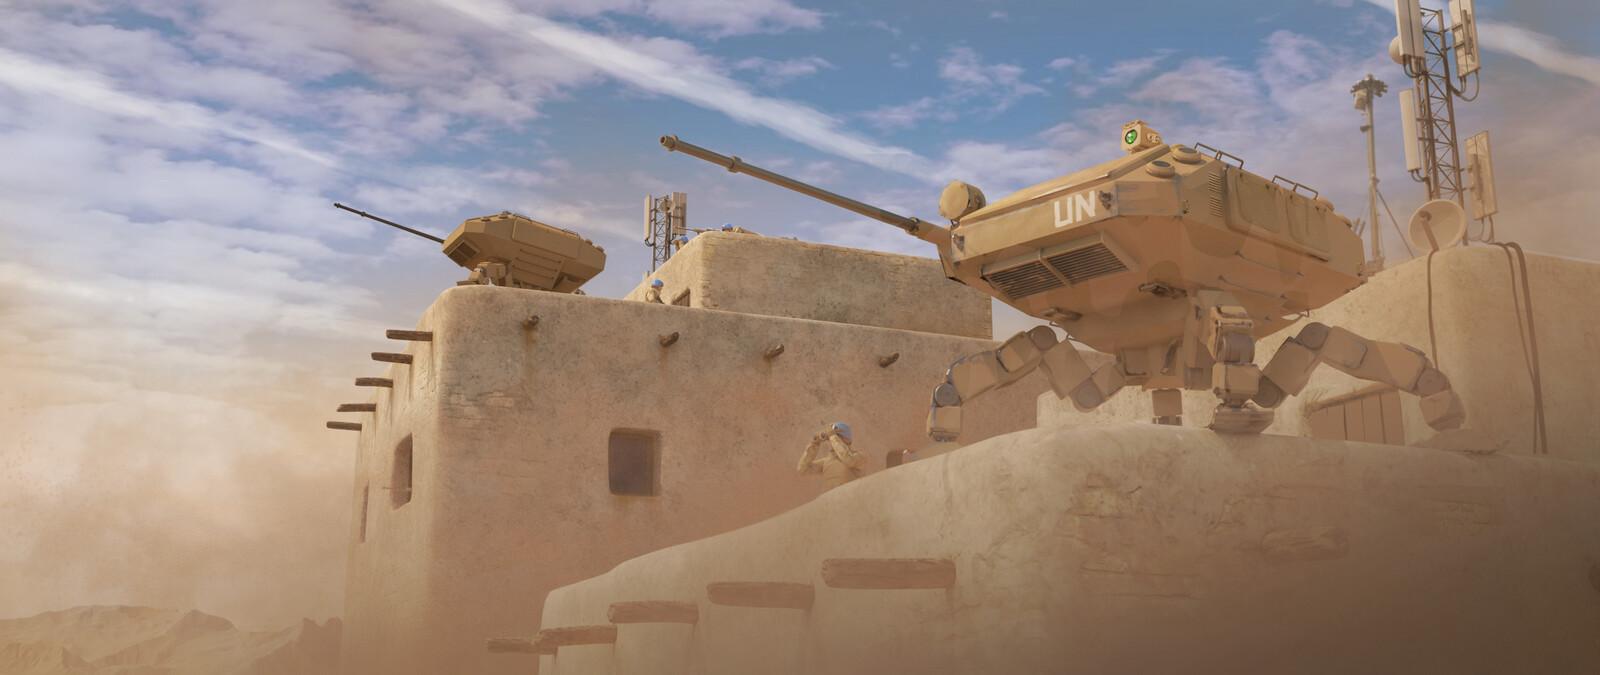 UN Scout Tank